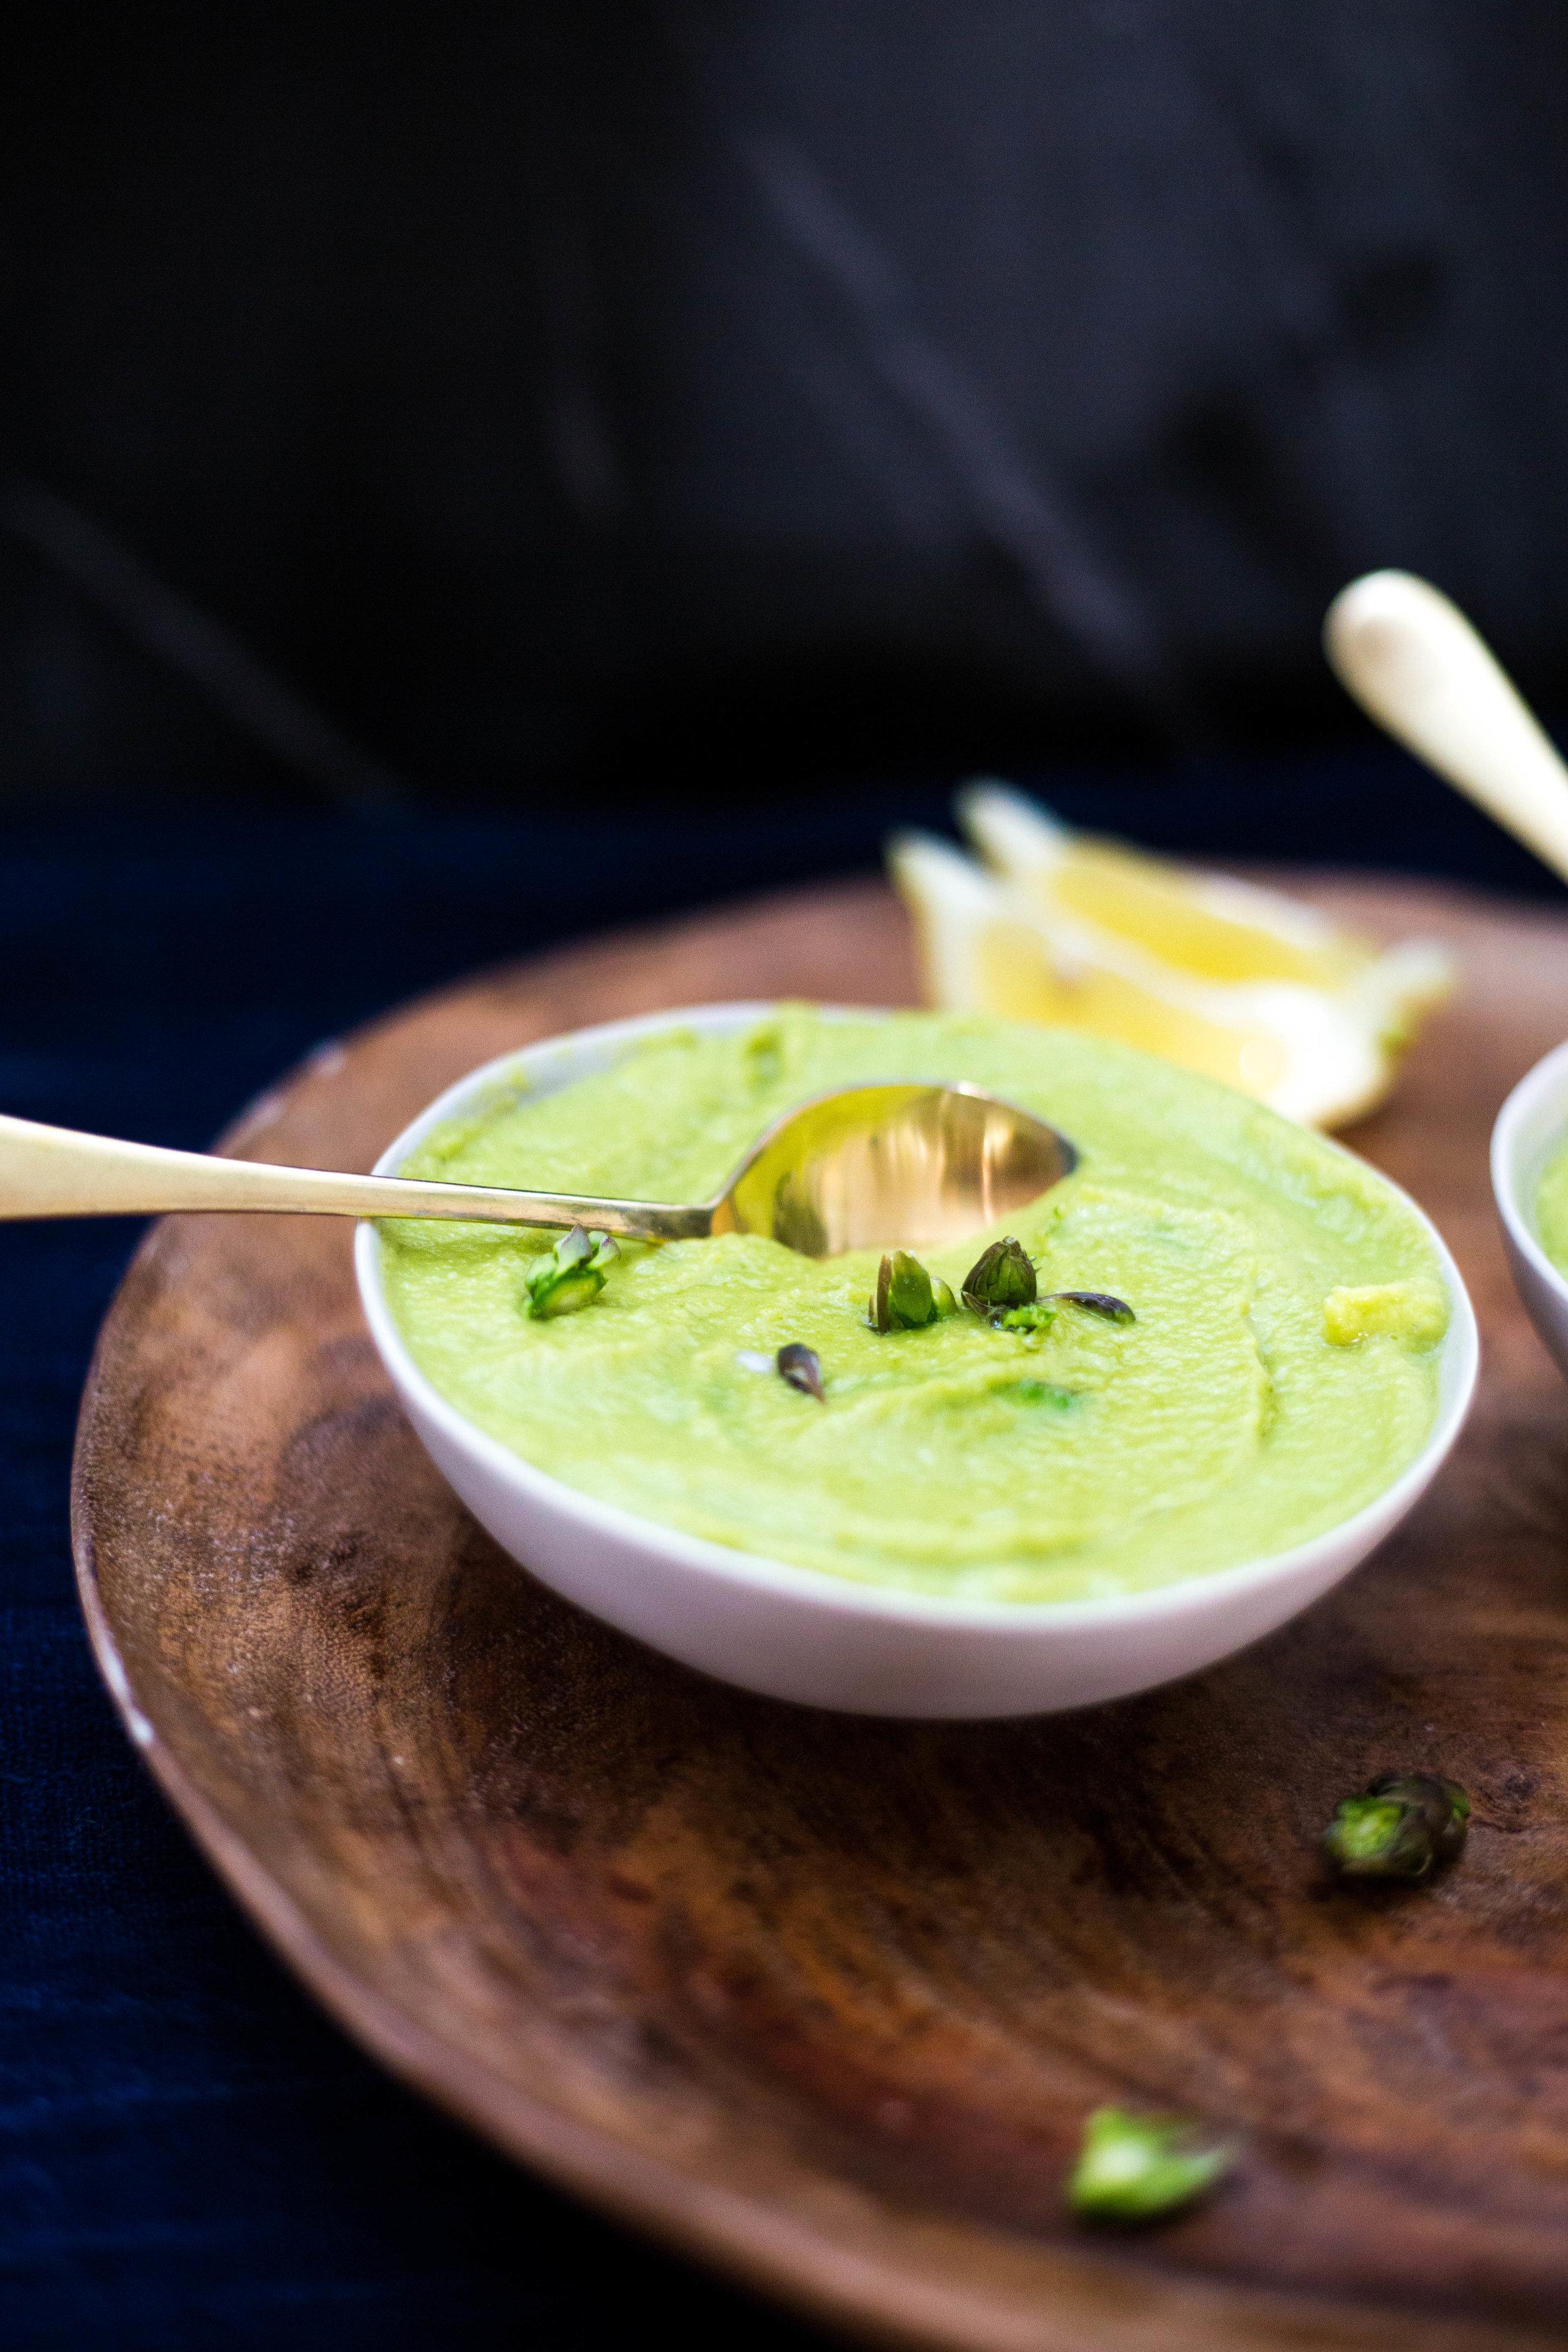 Cleansing Fennel Asparagus Gazpacho Soup